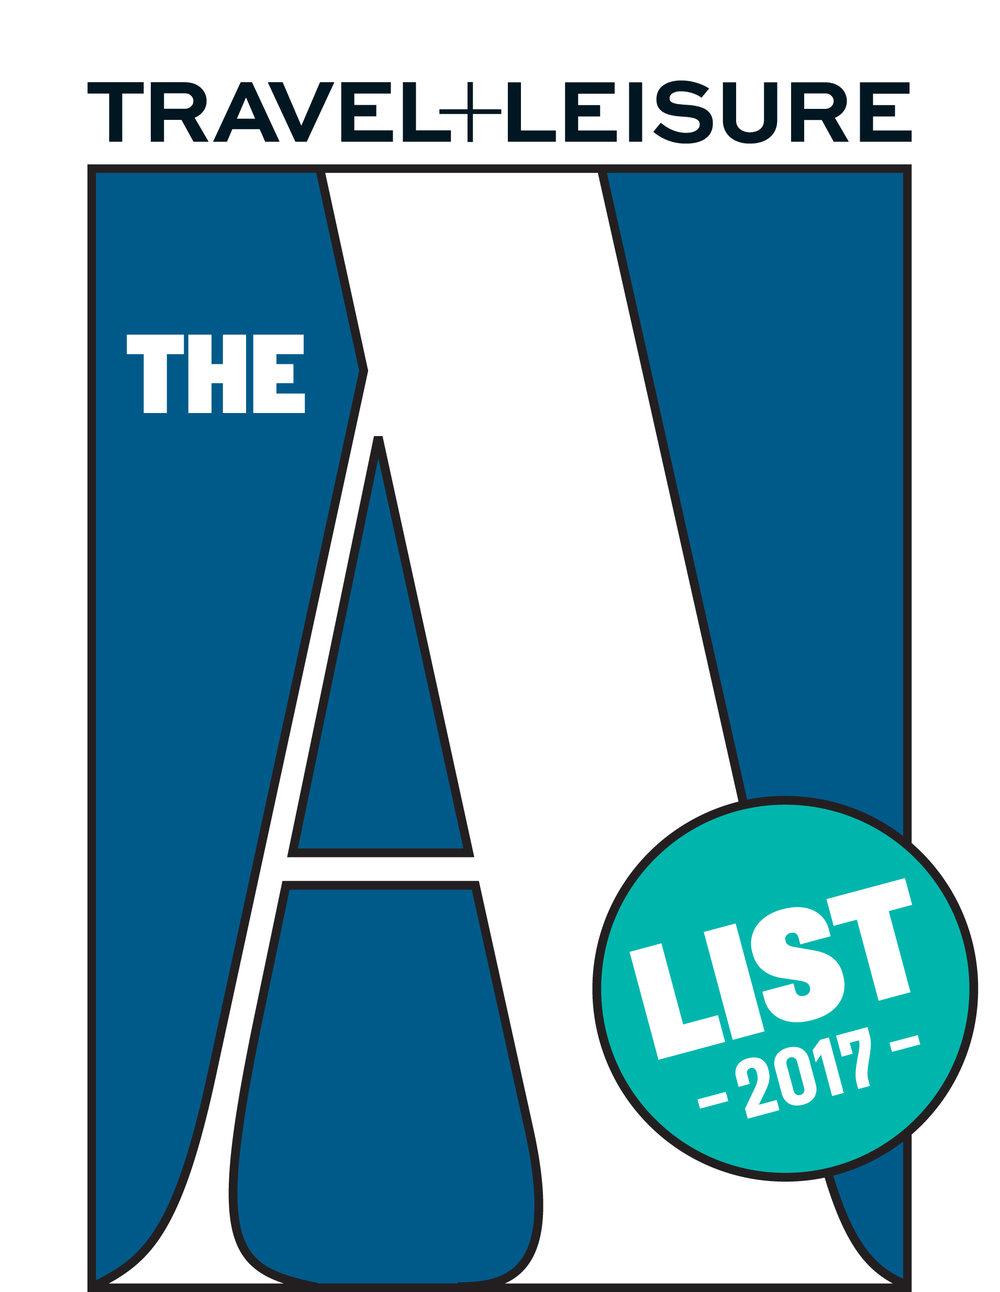 2017 A List